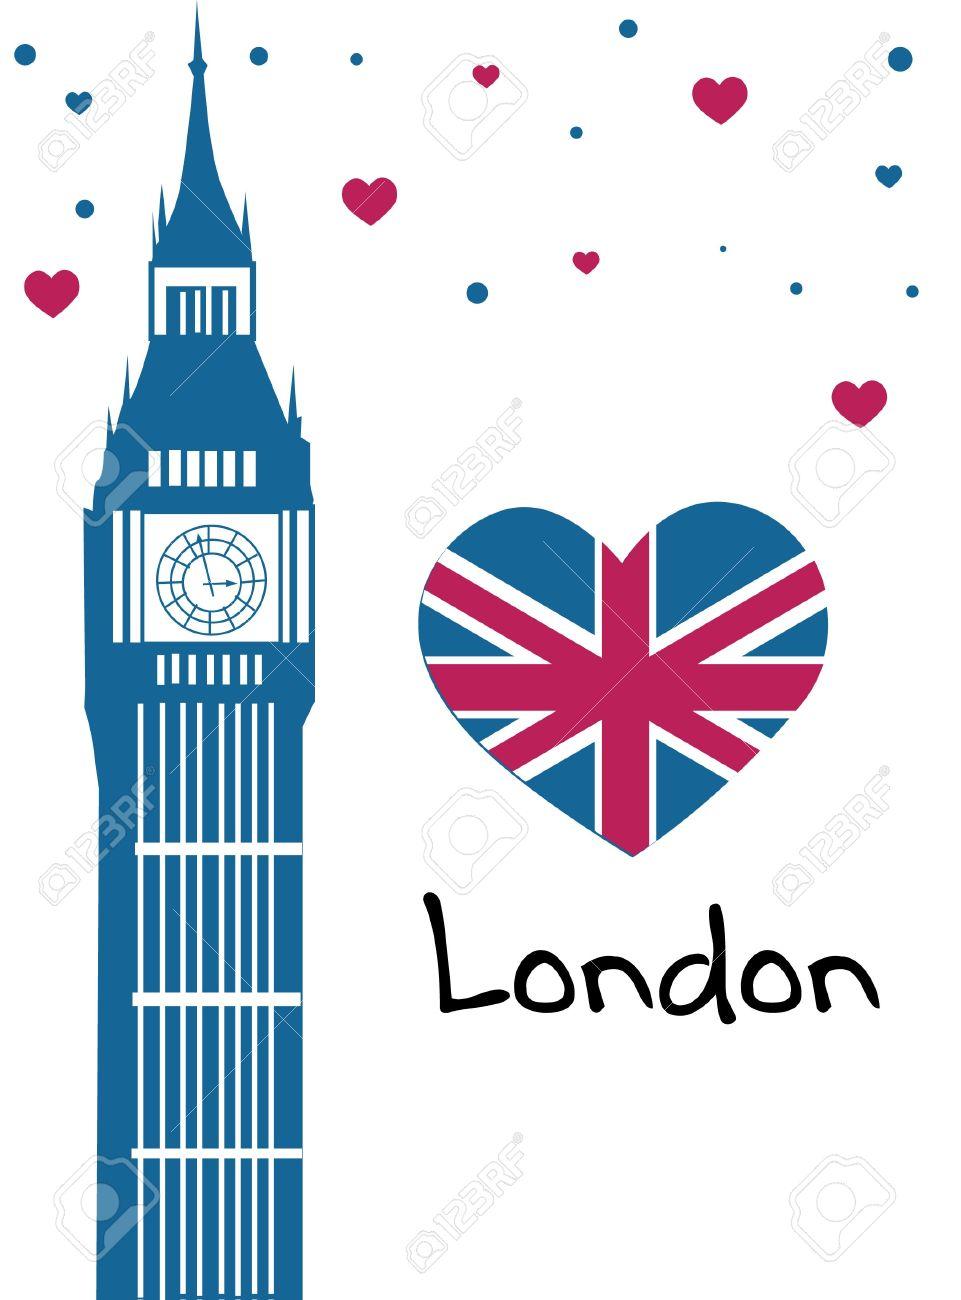 143 I Love London Cliparts, Stock Vector And Royalty Free I Love.